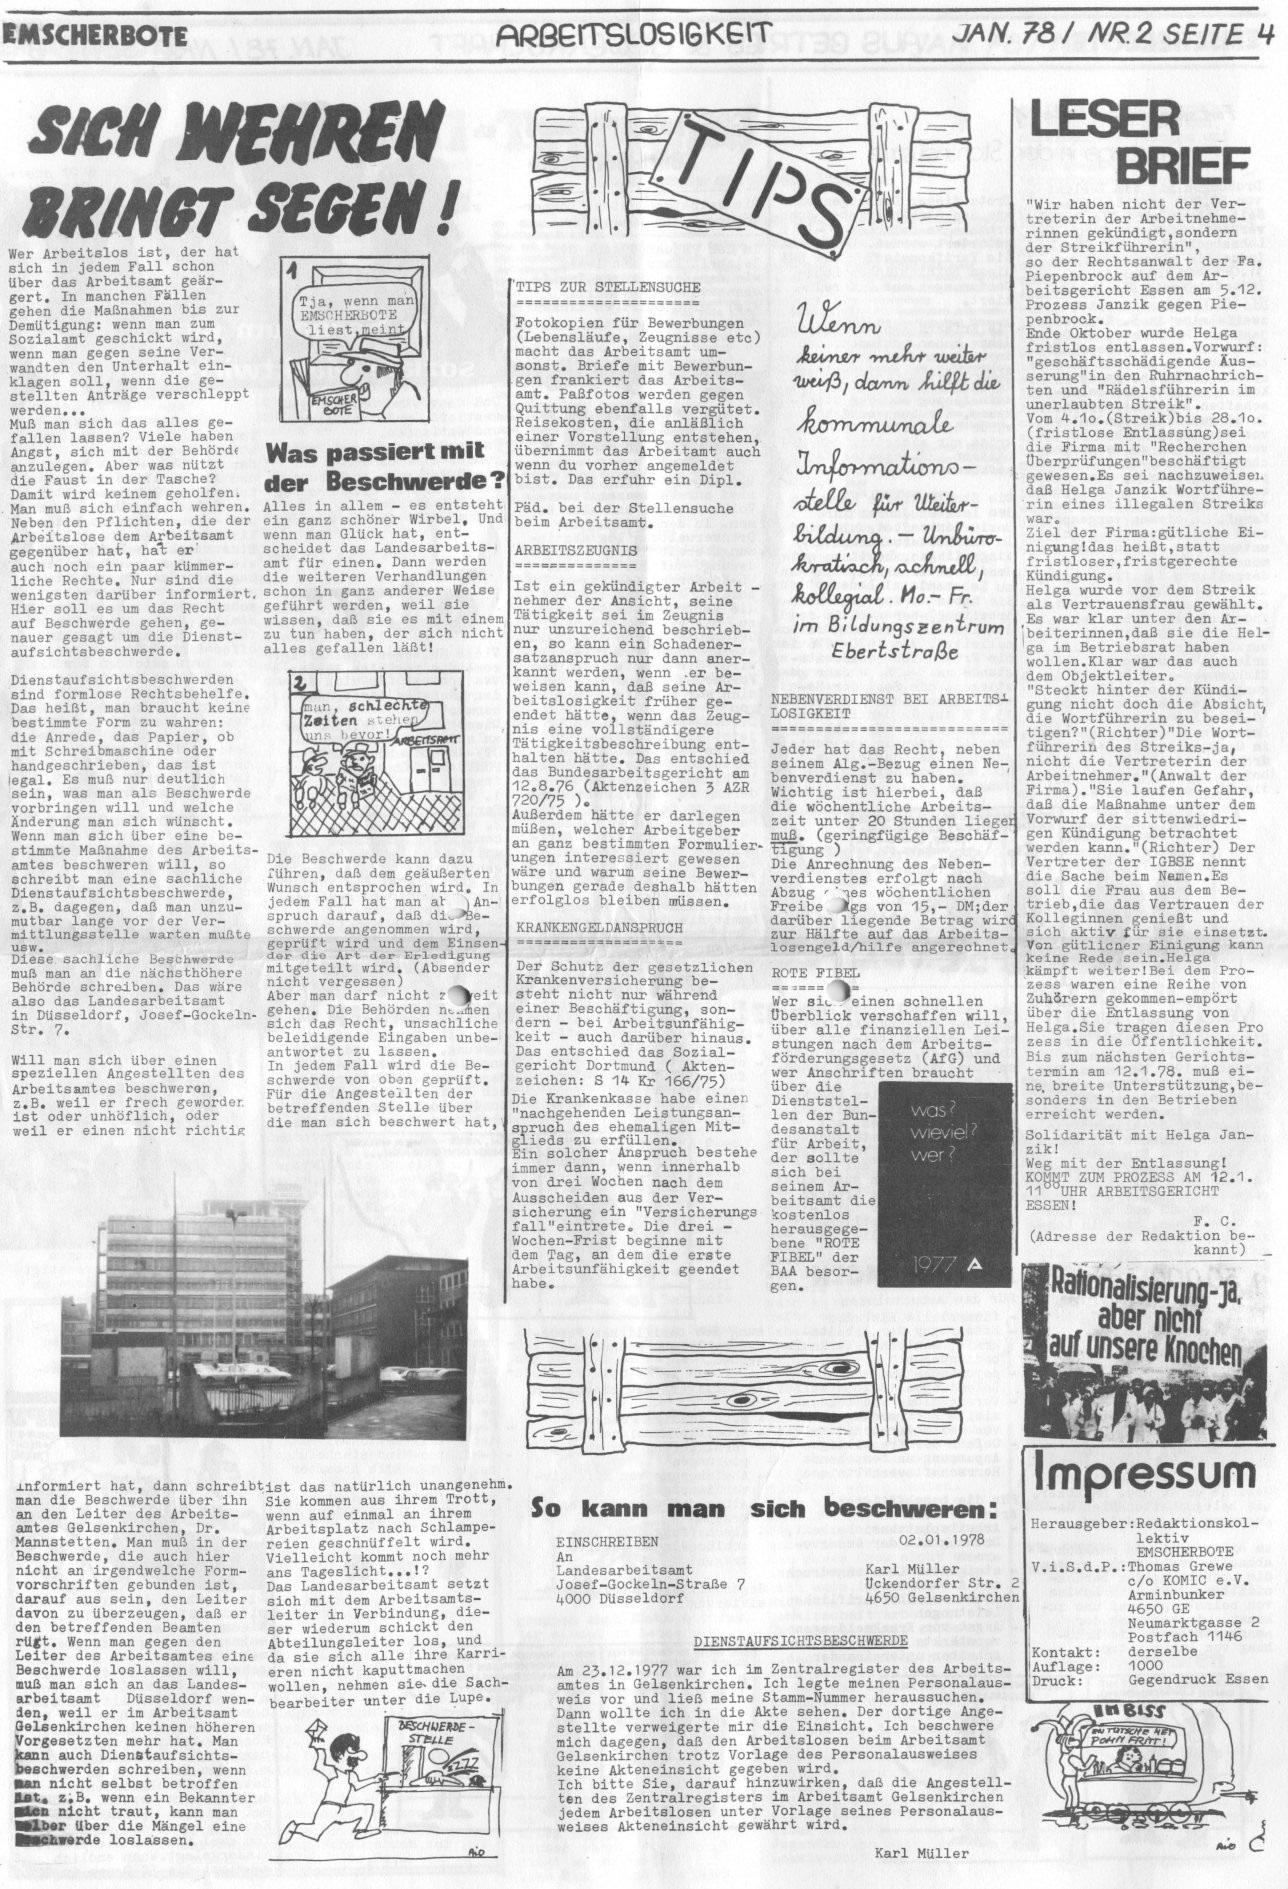 Gelsenkirchen_Emscherbote_1978_02_04